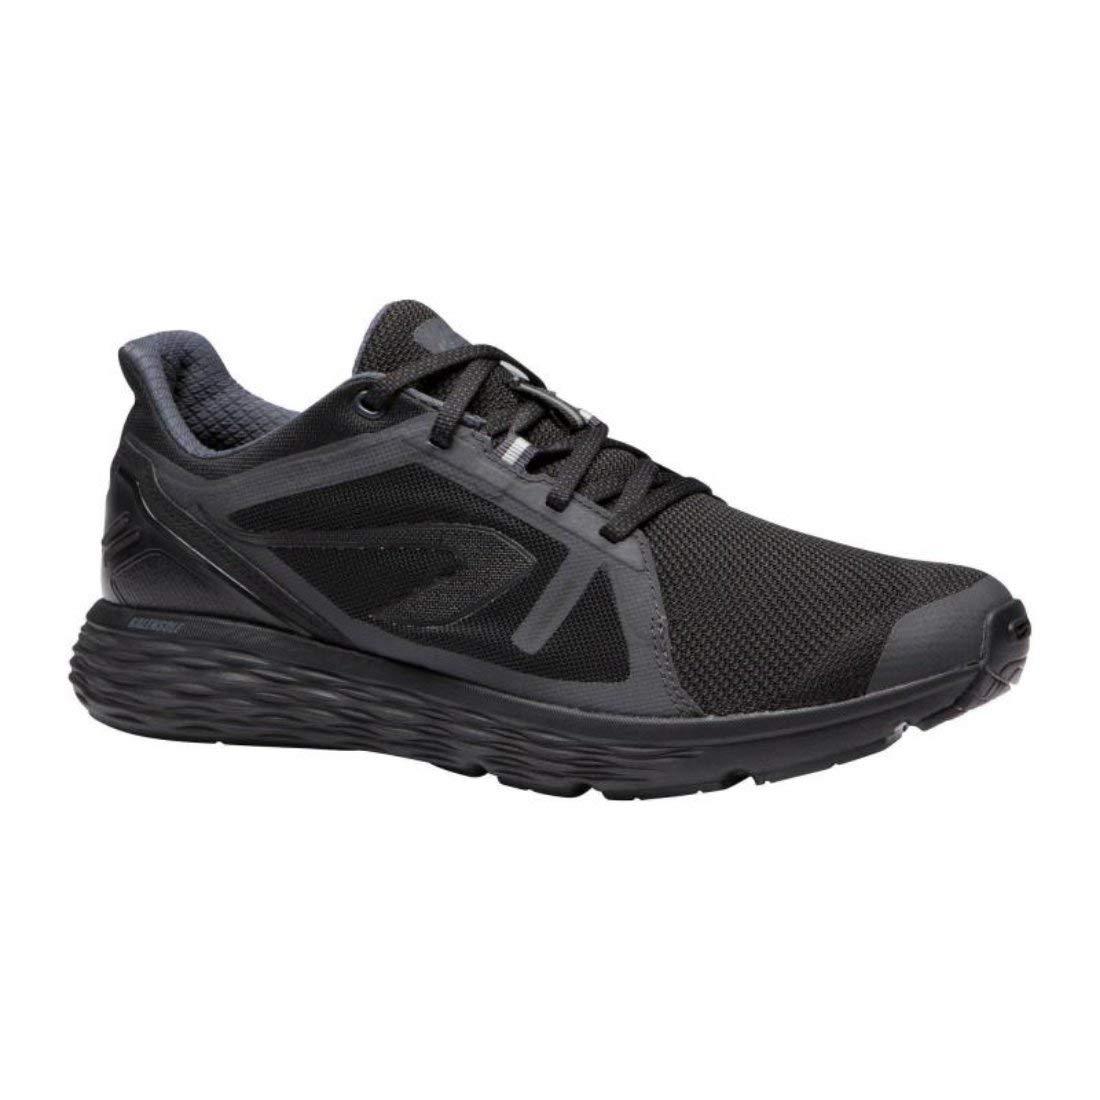 ab51f66a1ea7 Kalenji Run Comfort Men s Running Shoes - Black  Buy Online at Low ...